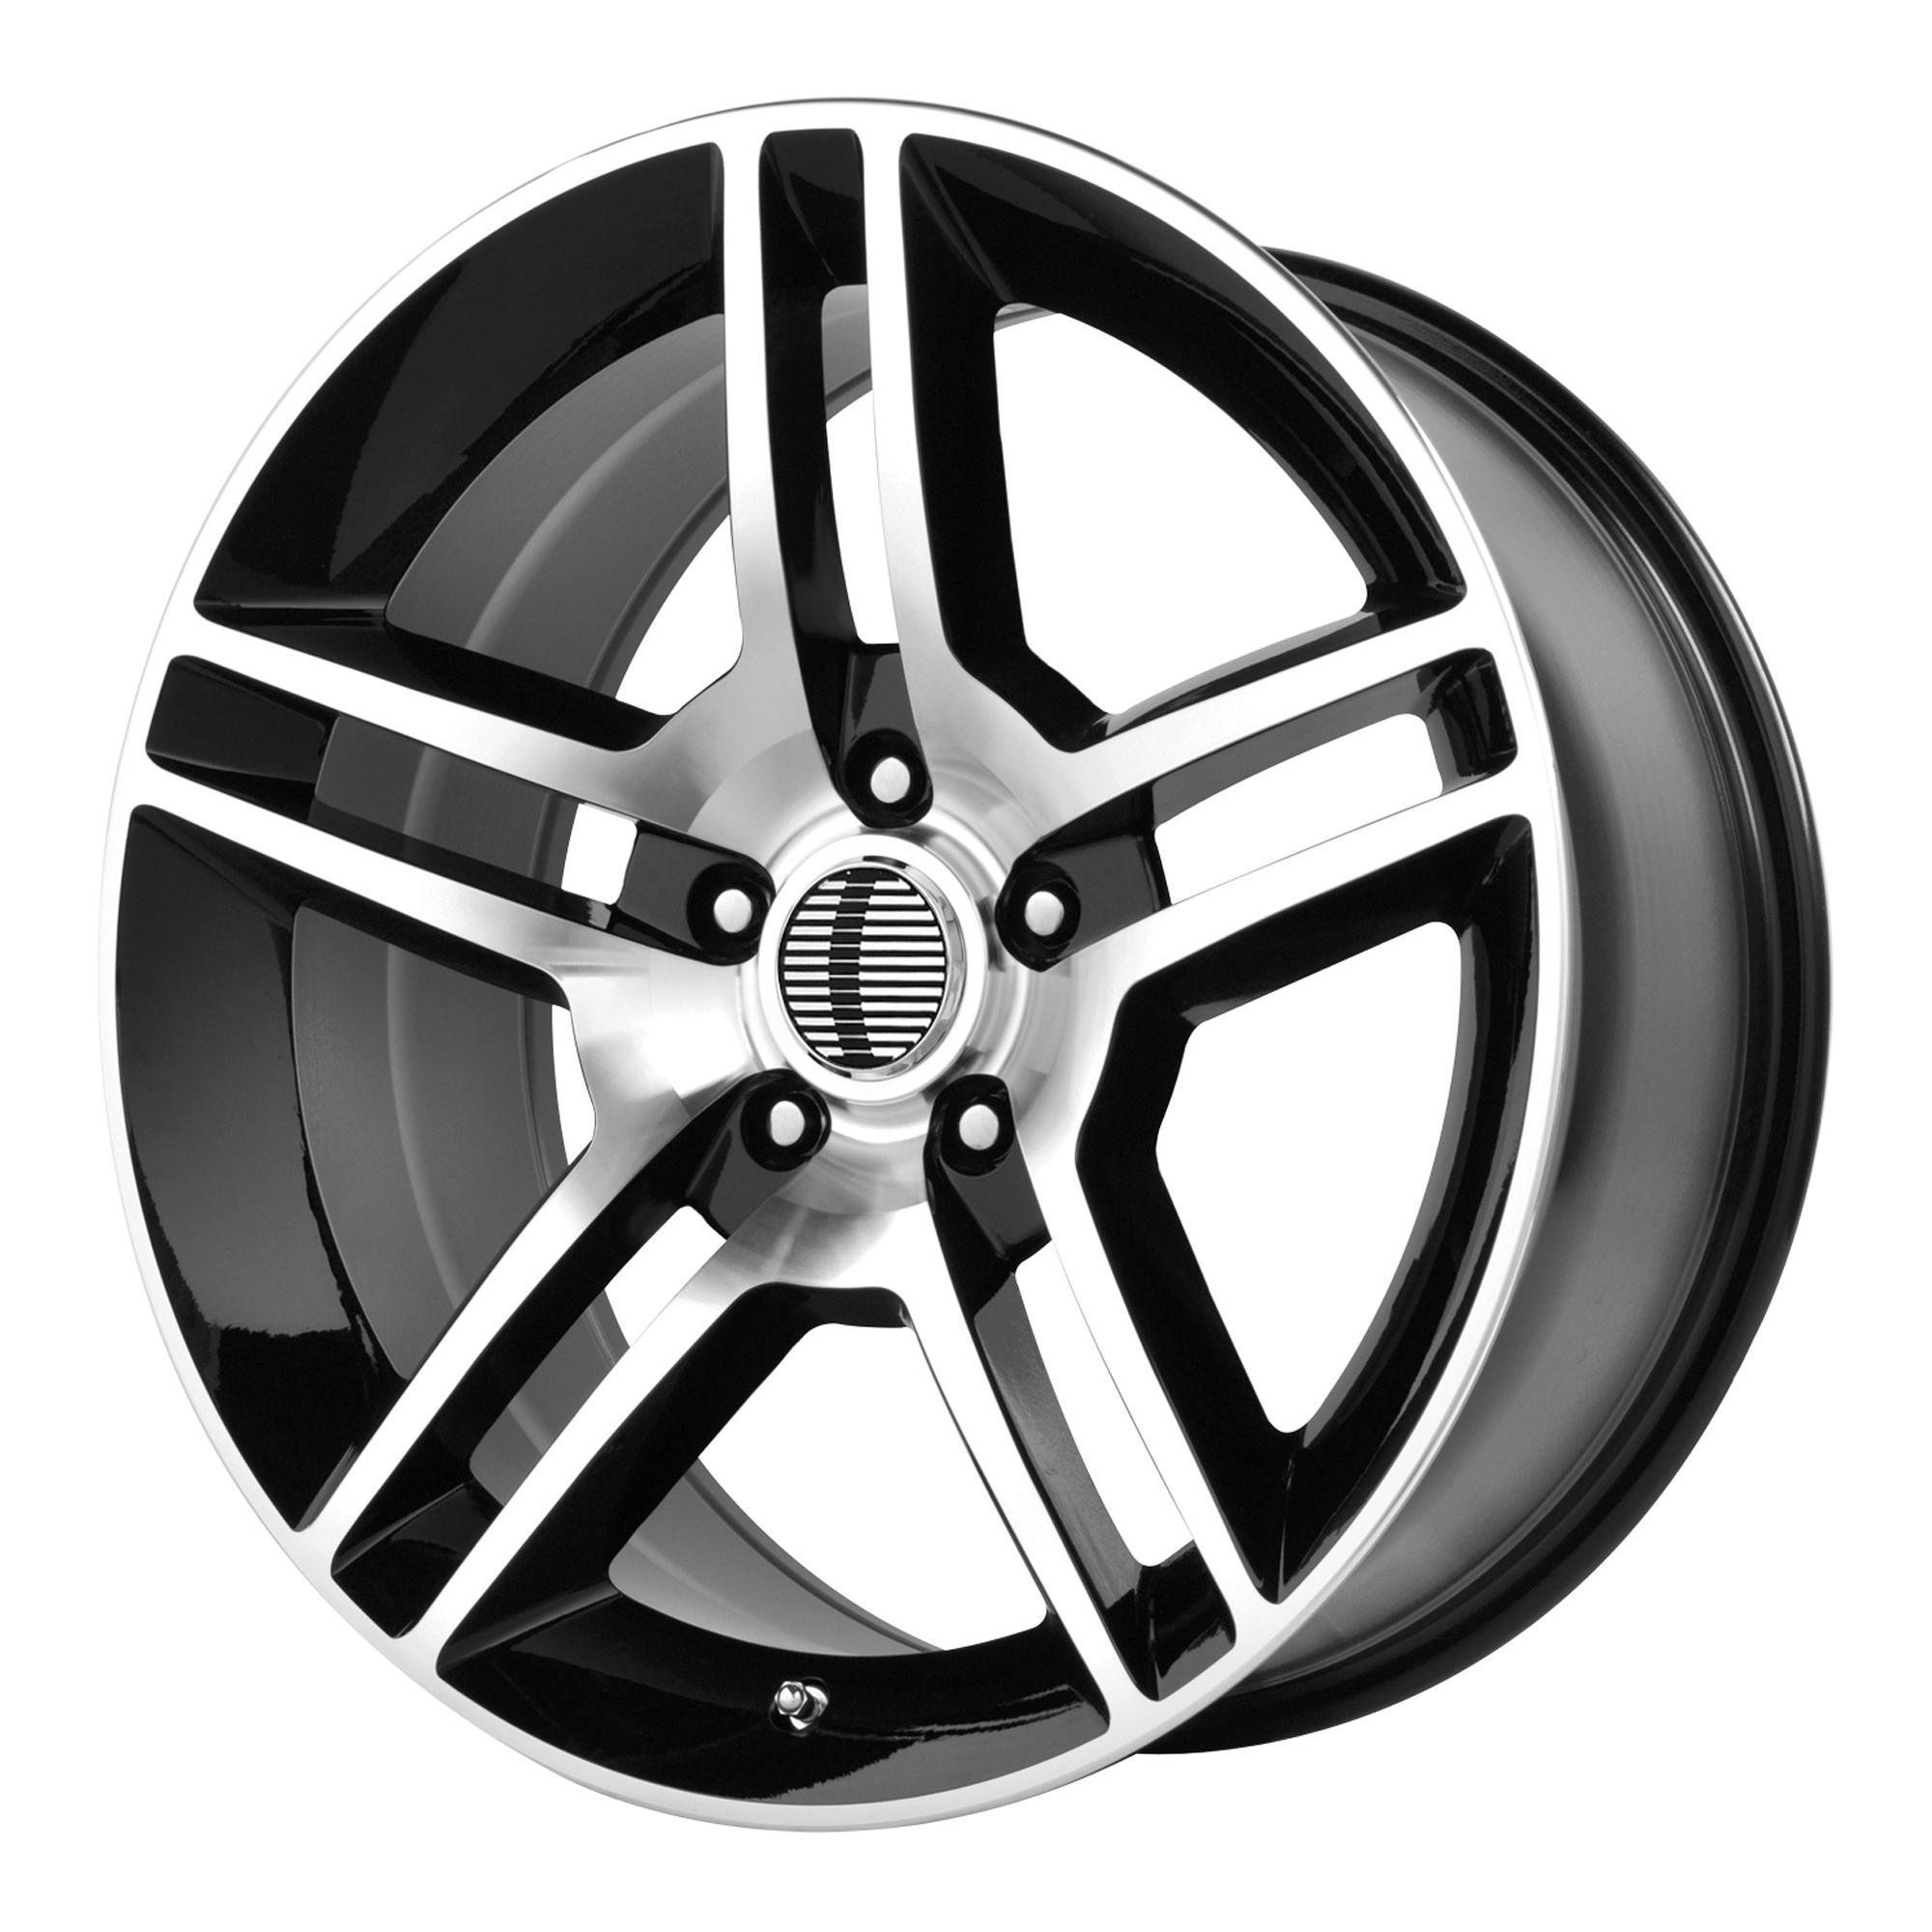 OE Creations Replica Wheels OE Creations 101C Gloss Black